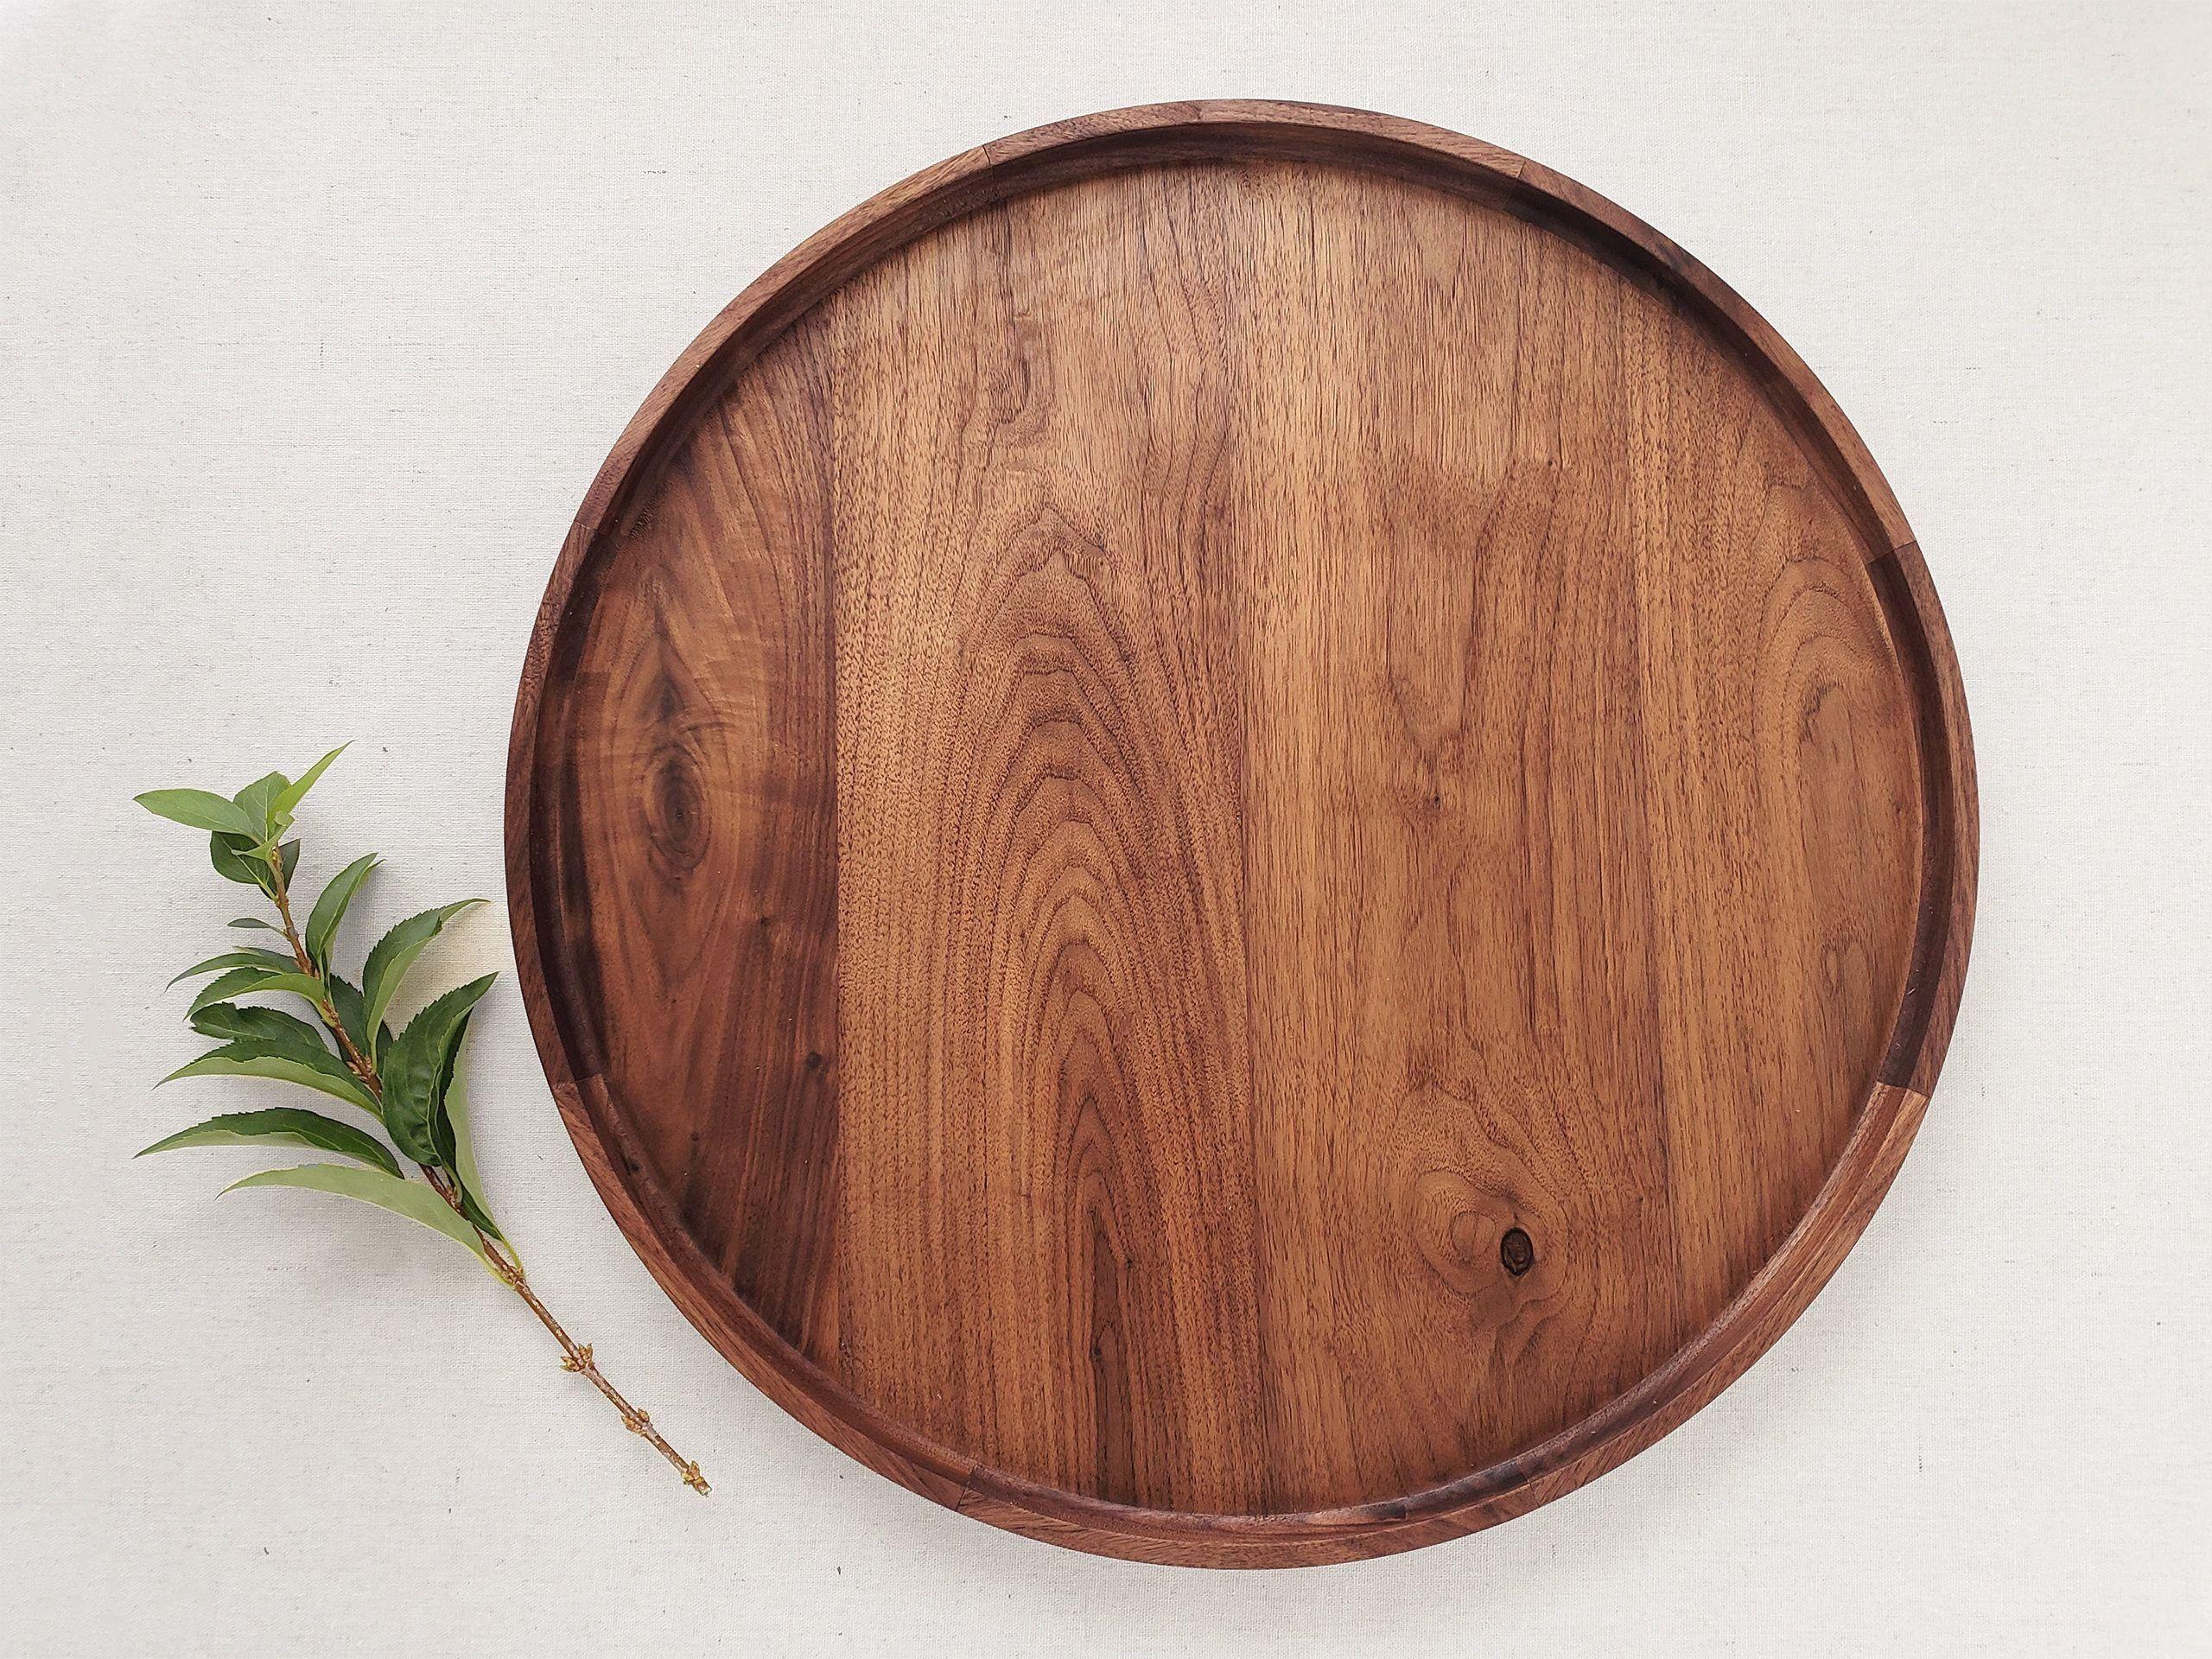 Round Wood Tray Black Walnut Circle Valet Coffee Table Etsy 1000 Round Wood Tray Wood Tray Wood Coffee Table Tray [ 1920 x 2560 Pixel ]